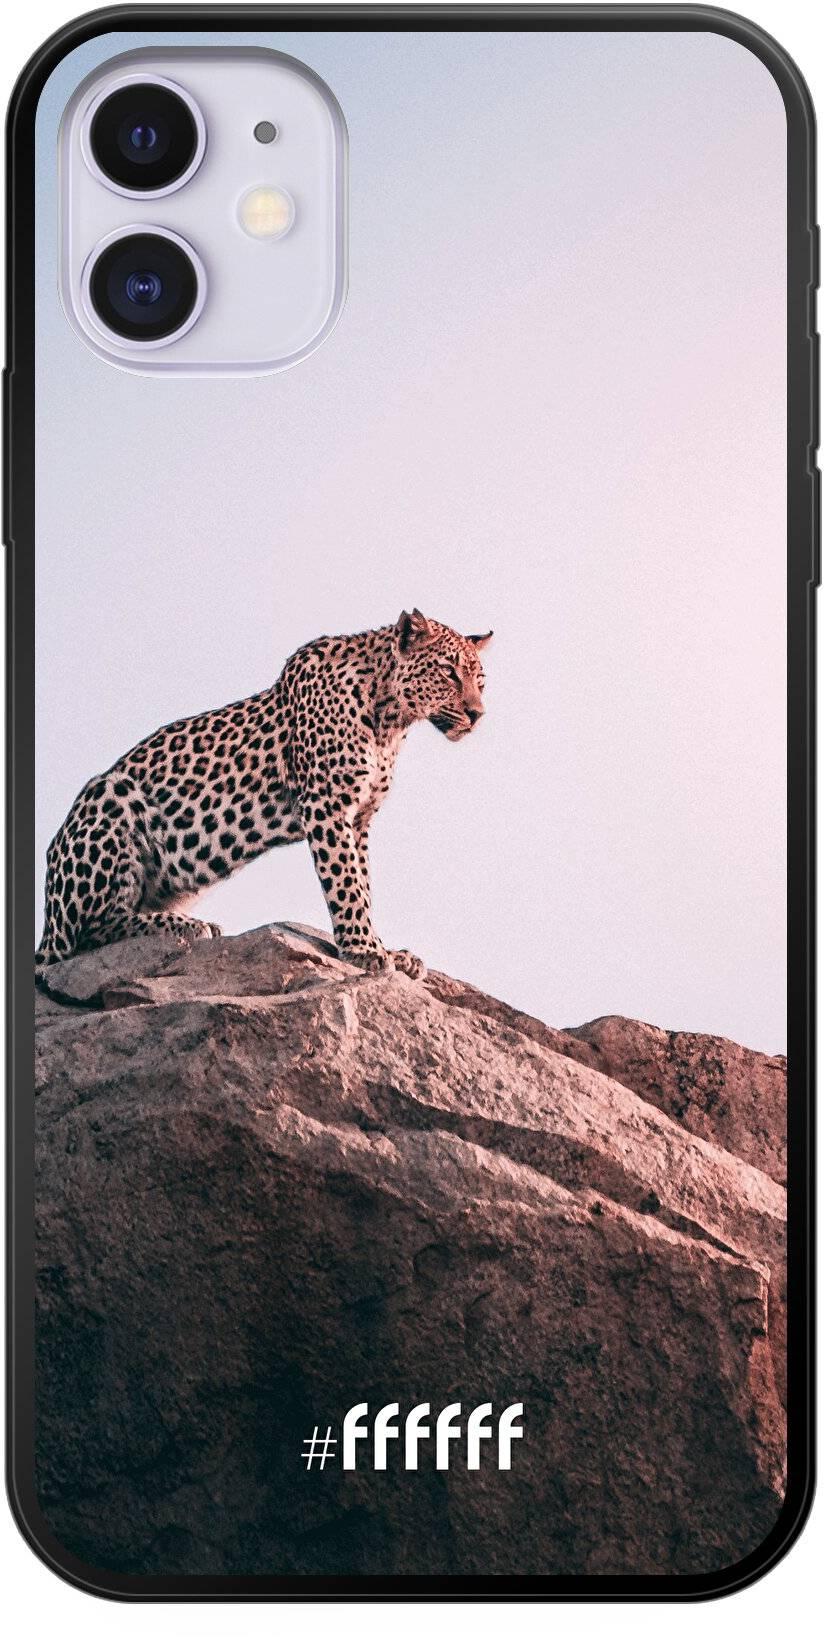 Leopard iPhone 11